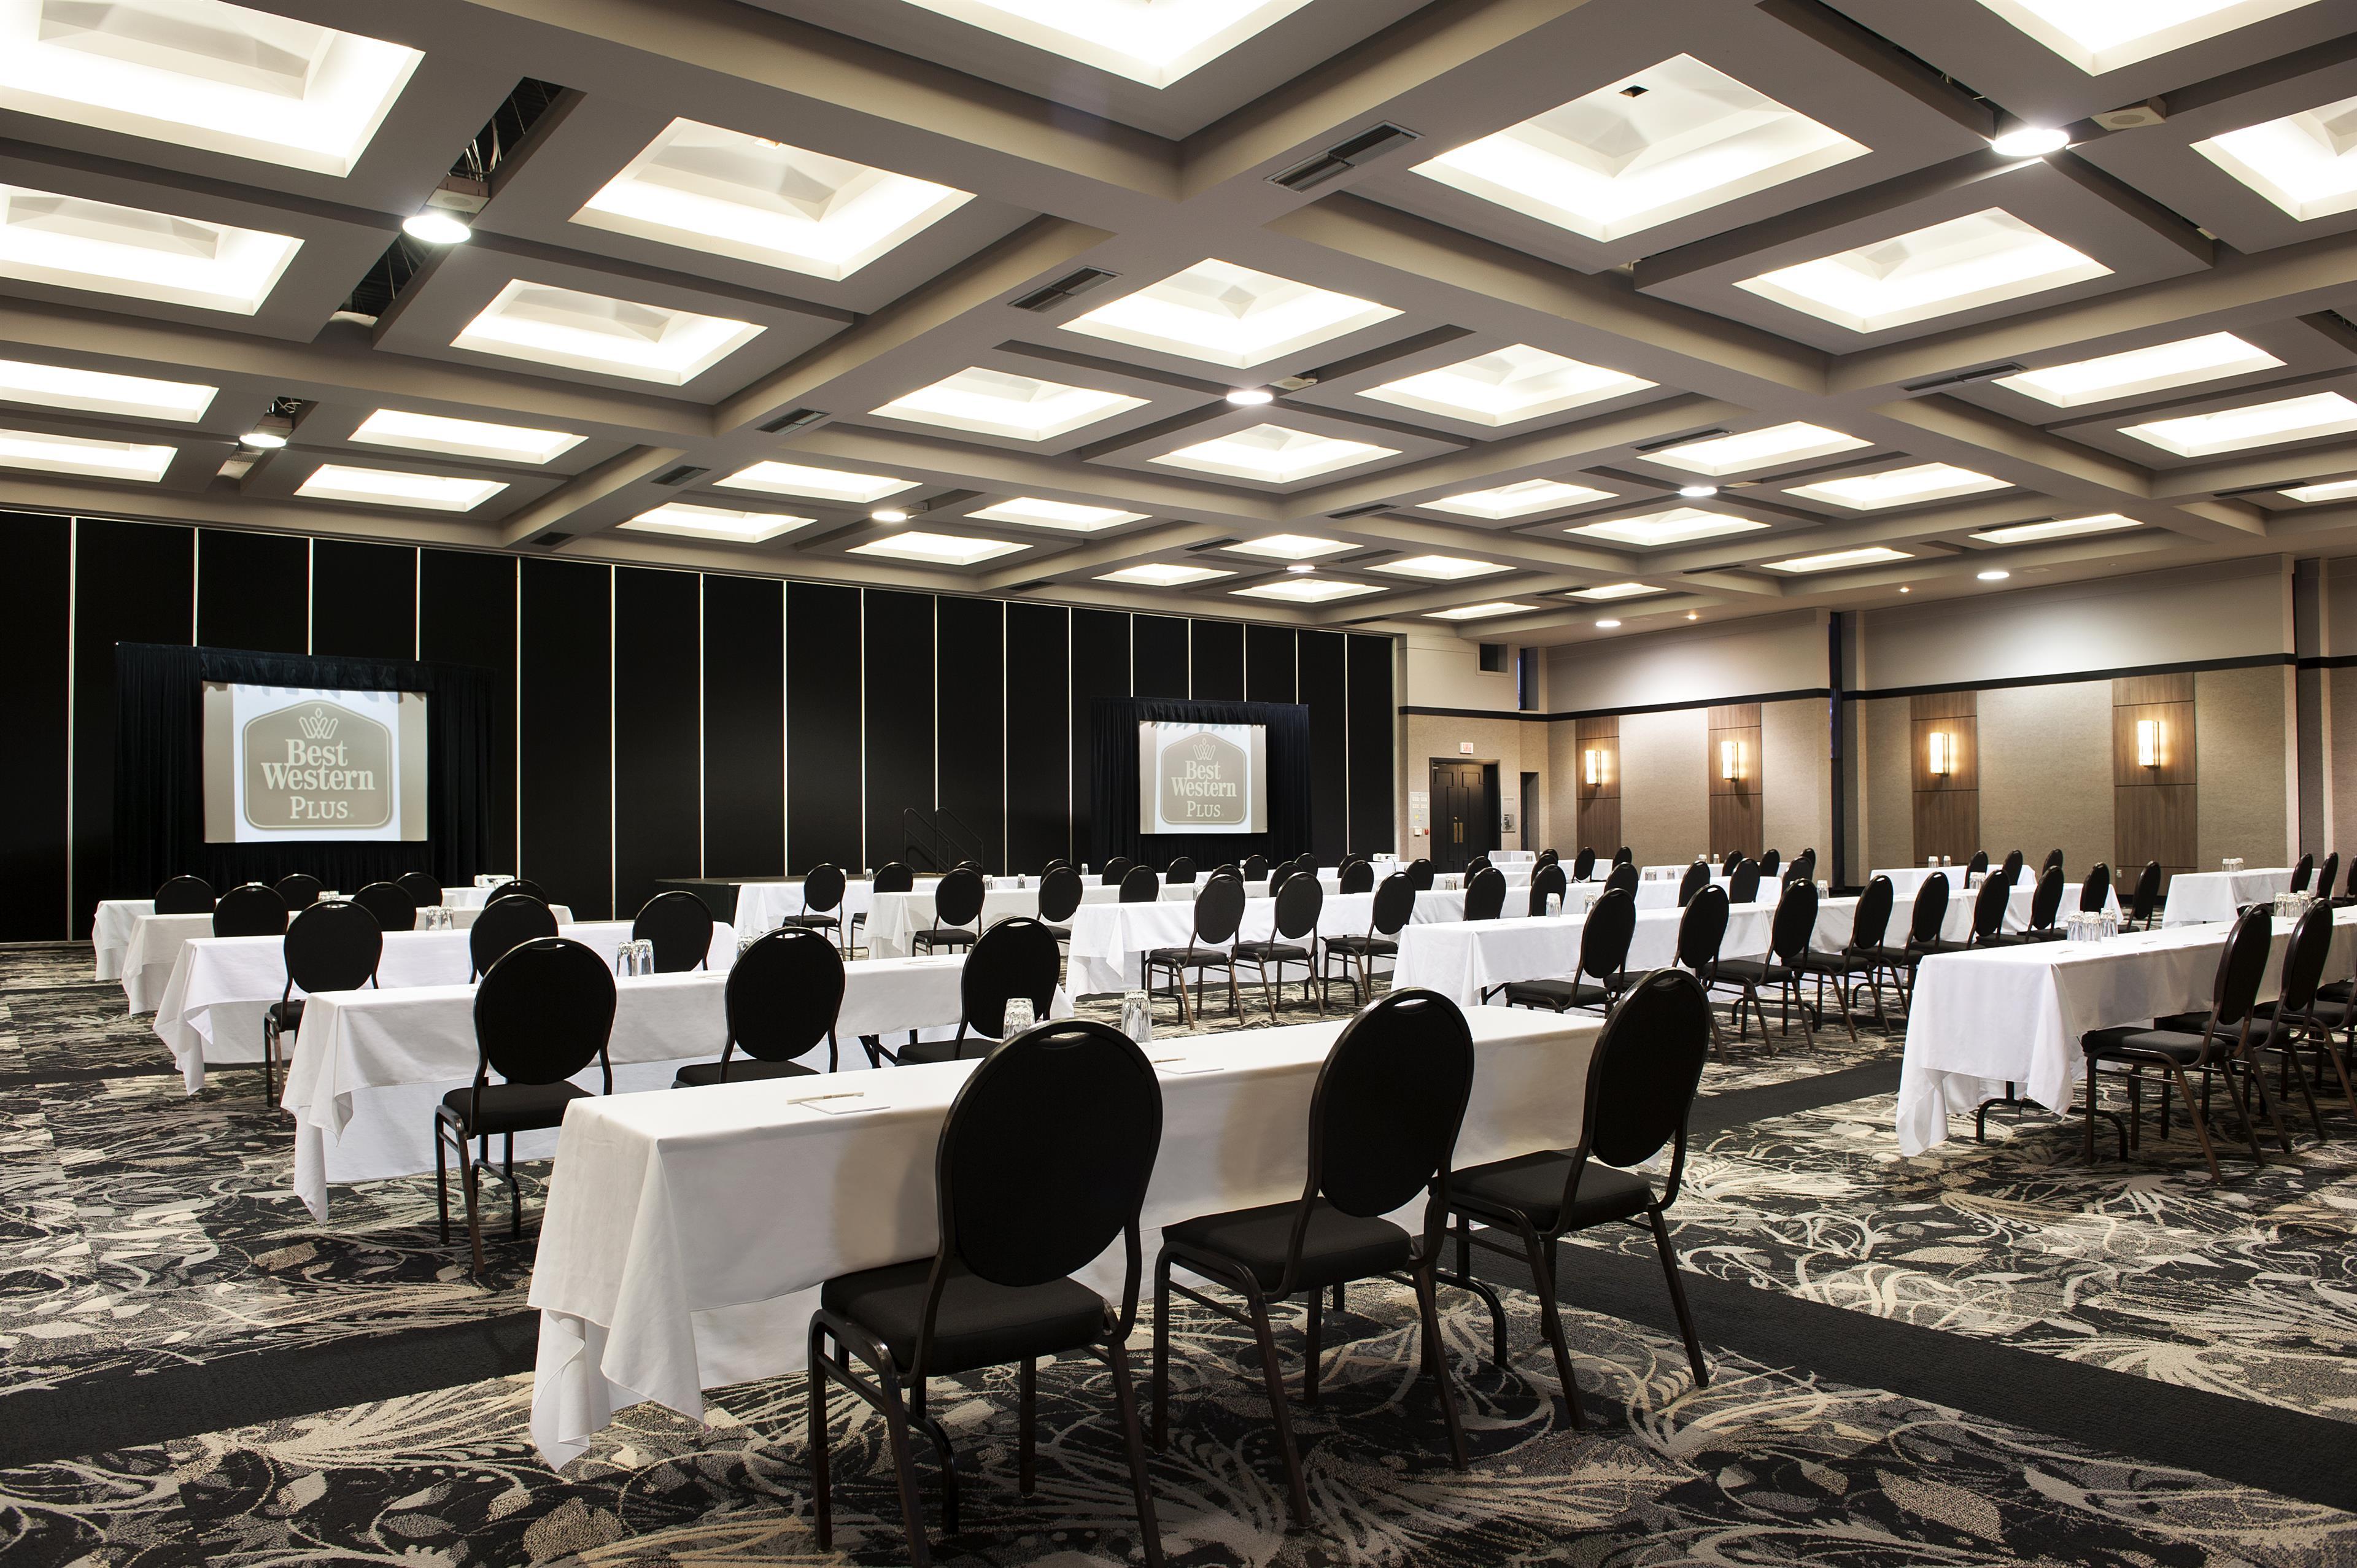 Best Western Hotel Universel Drummondville à Drummondville: Banquet Room